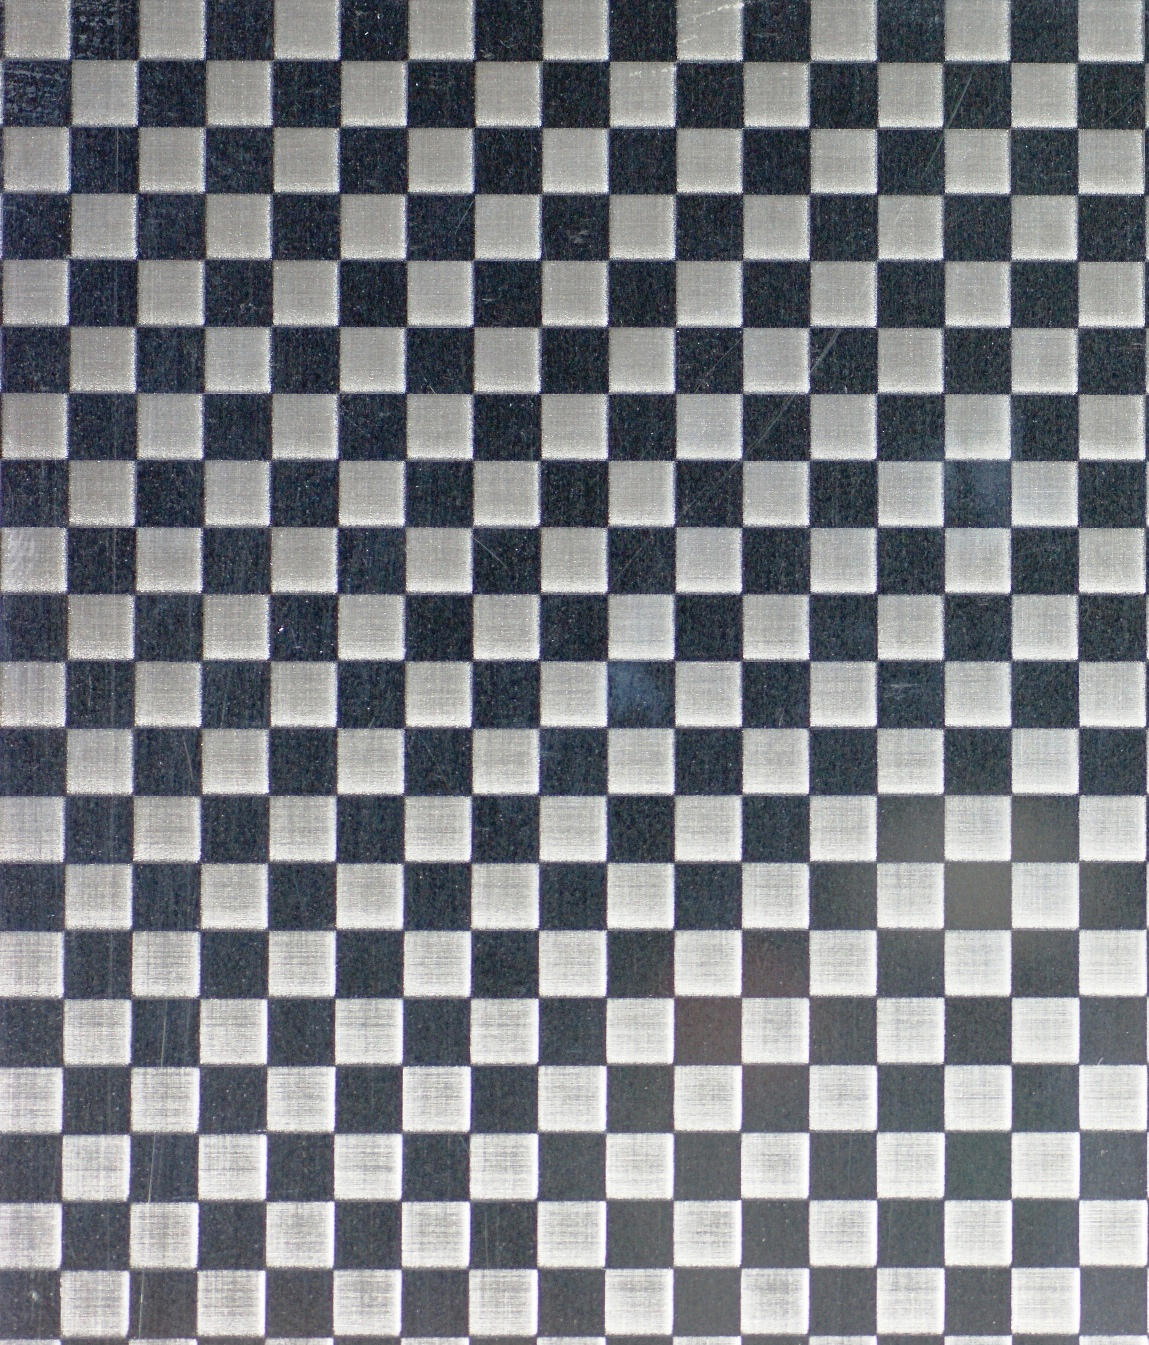 chess board 290 sheets from inox schleiftechnik architonic